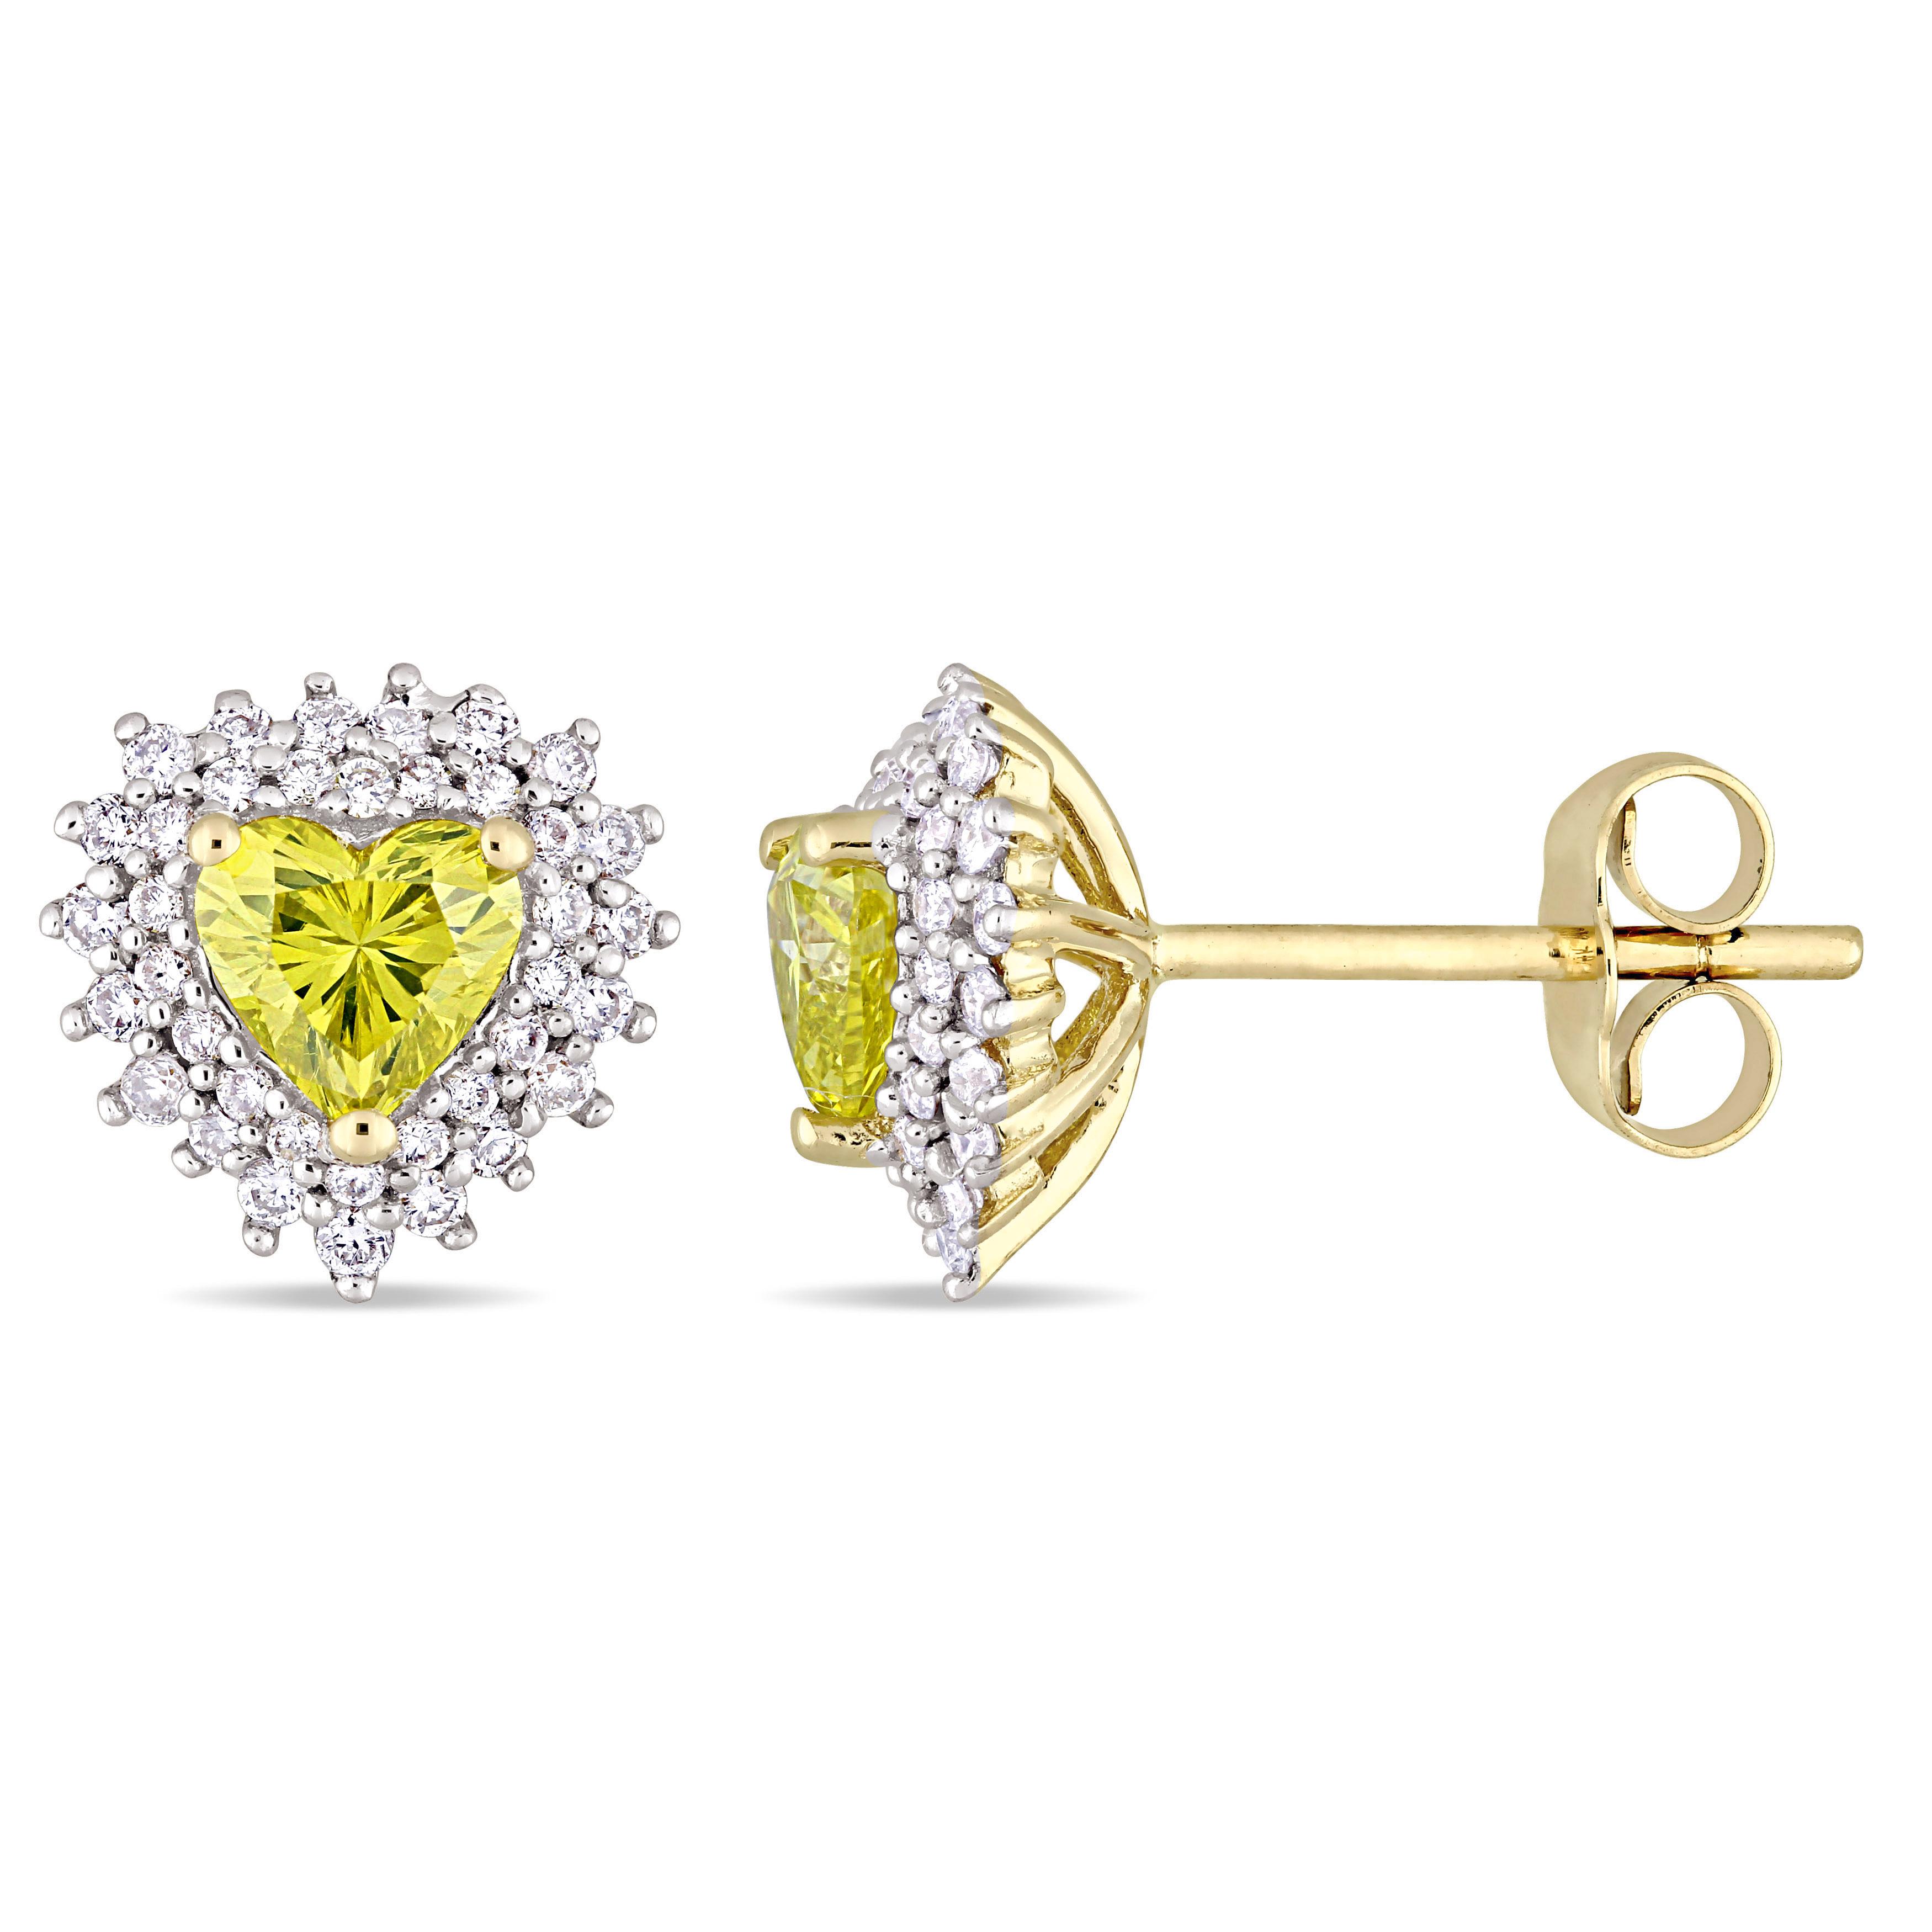 Halo Heart Yellow & White Diamond Earrings 14k Yellow Gold (1.00ct)